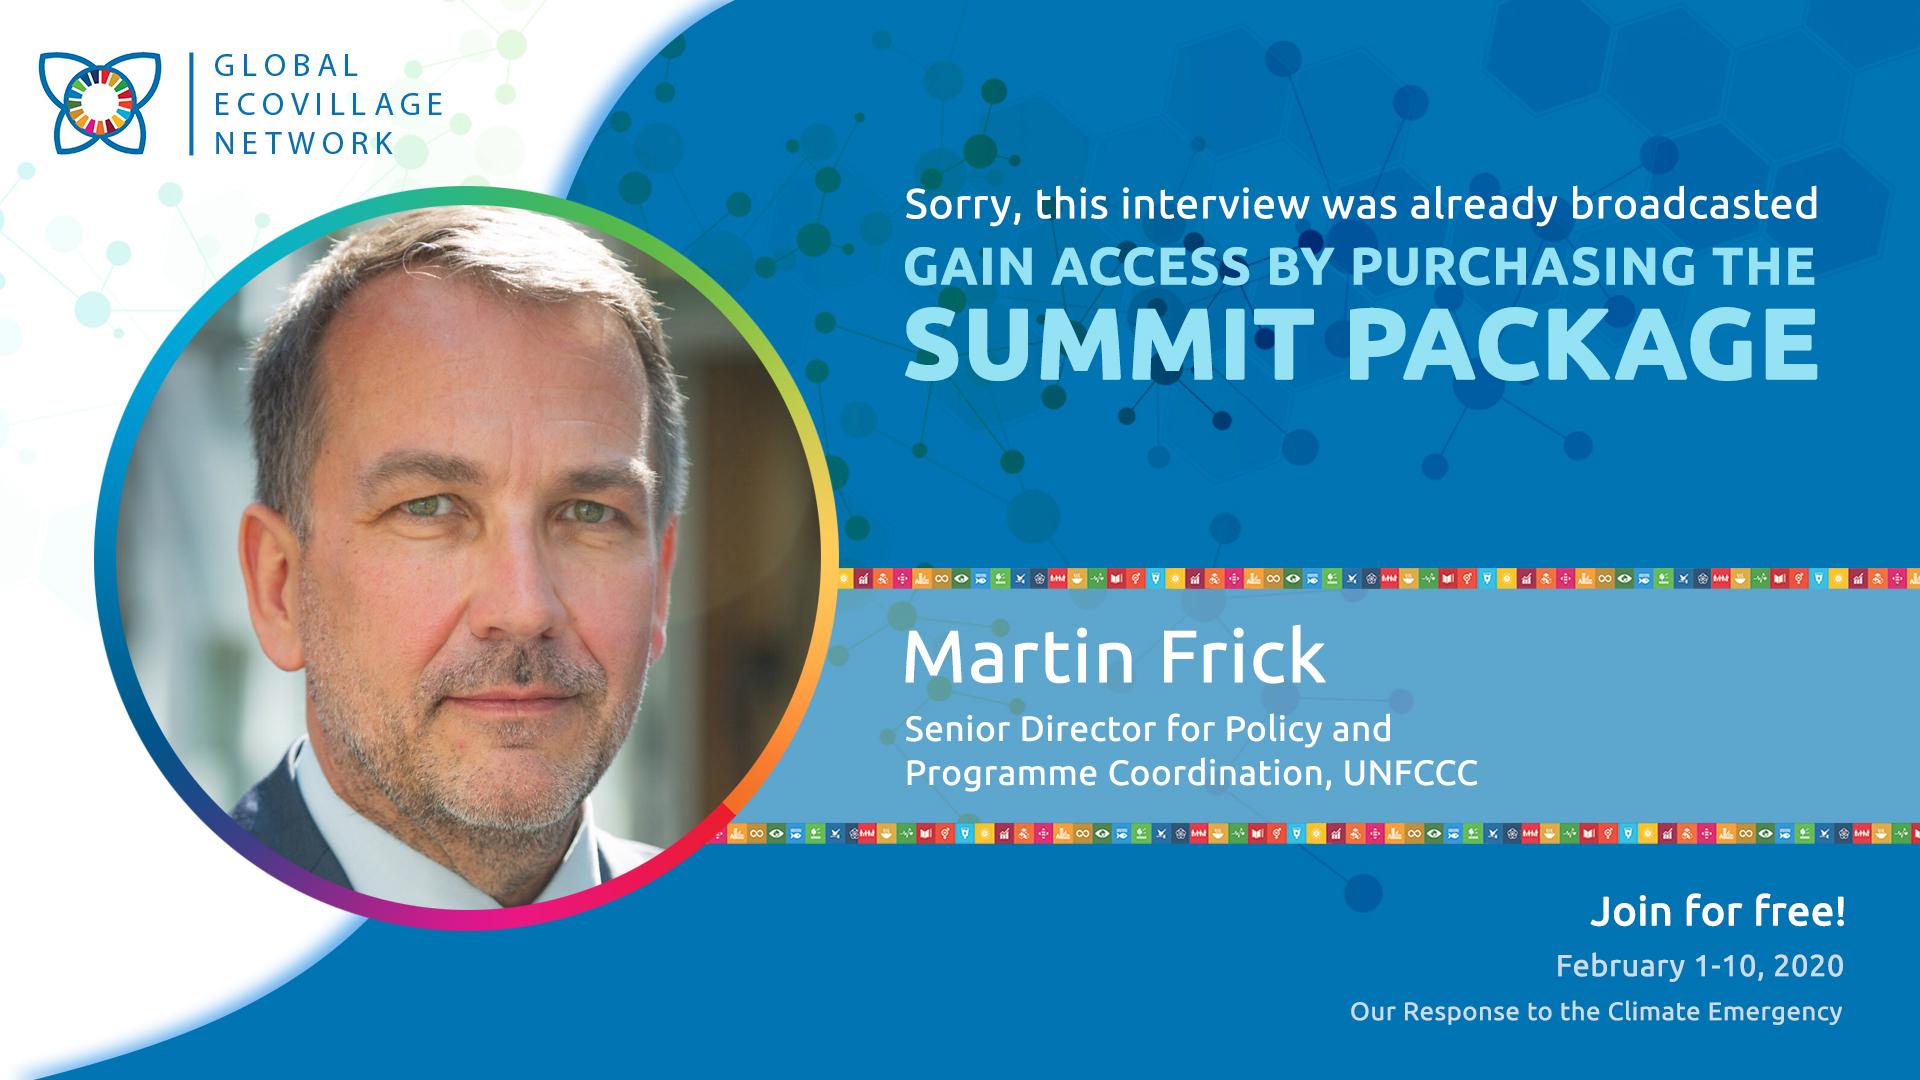 Martin Frick